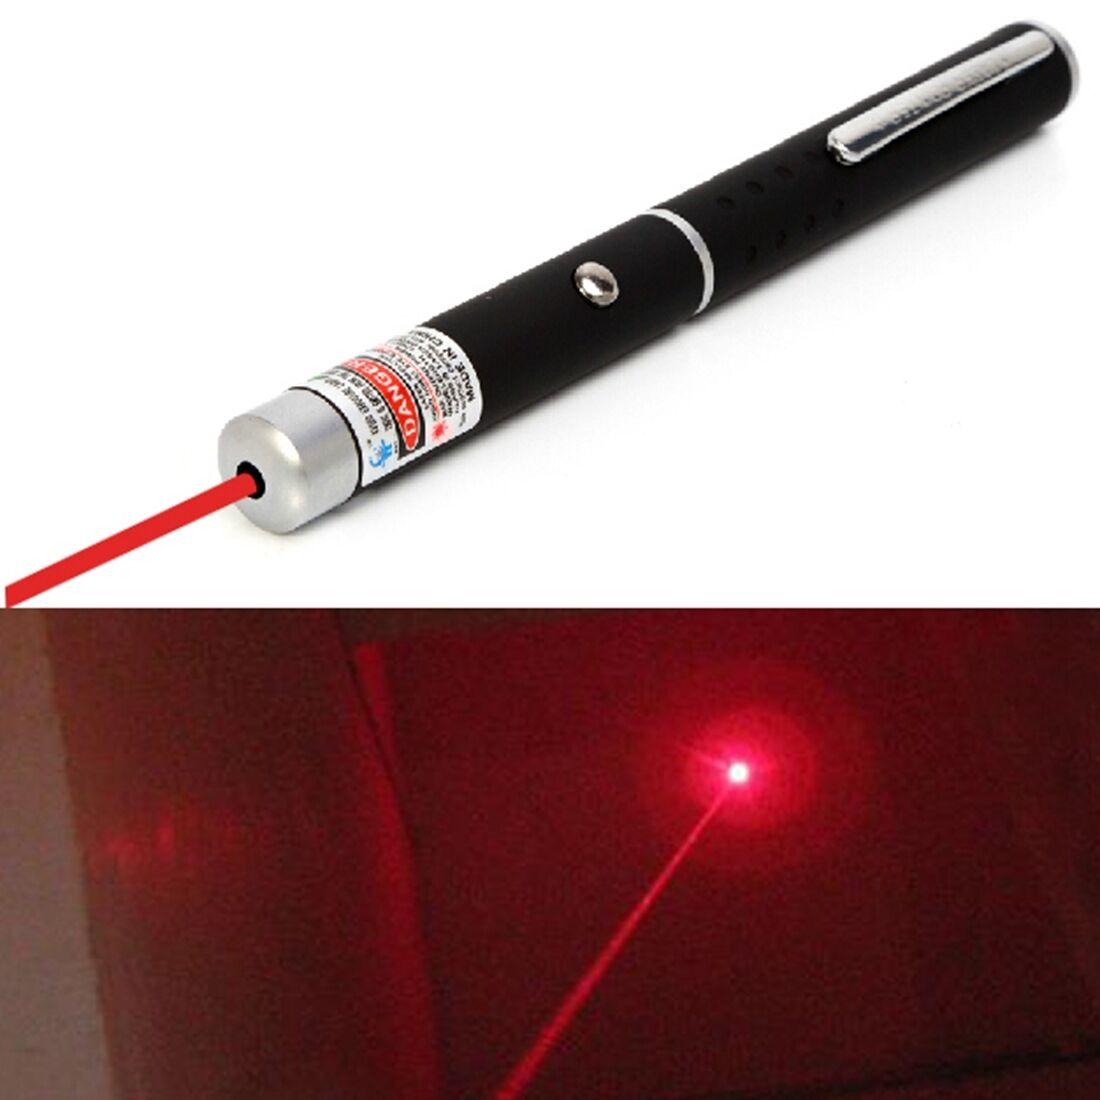 1mW 532nm Powerful Laser Pointer Pen Visible Beam Light Lazer Pen Toy Kids Gift 2